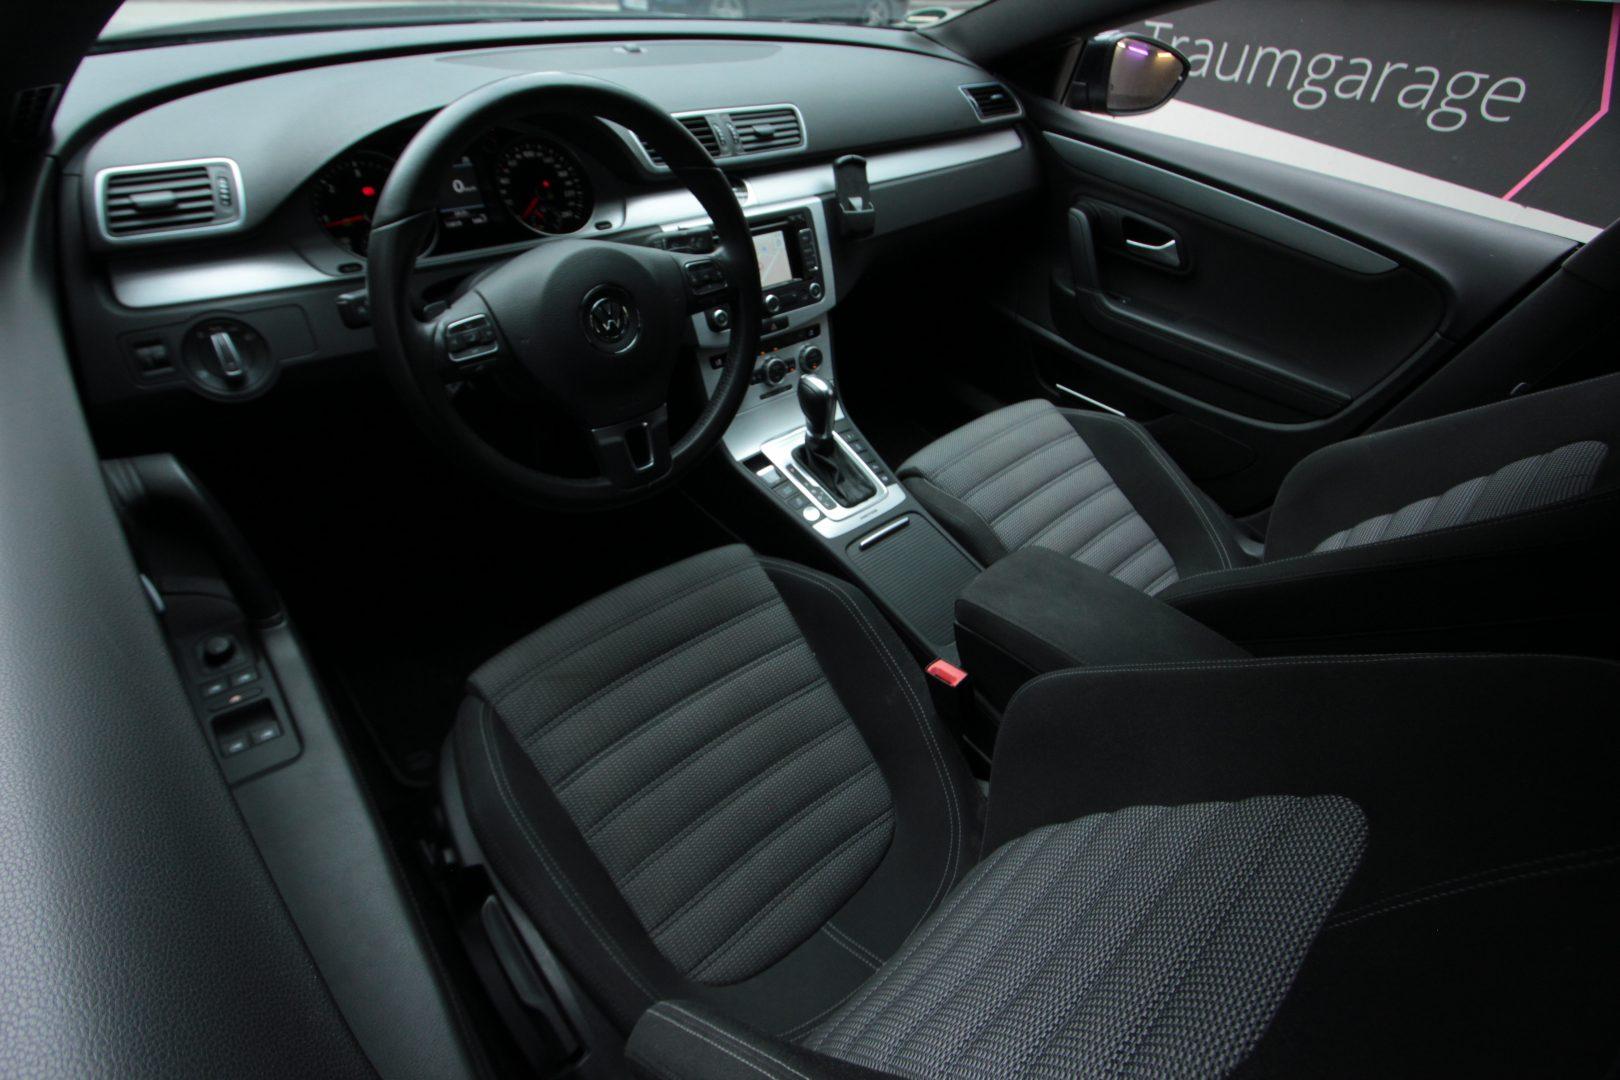 AIL VW CC 2.0TDI Basis BMT 4Motion DSG 4